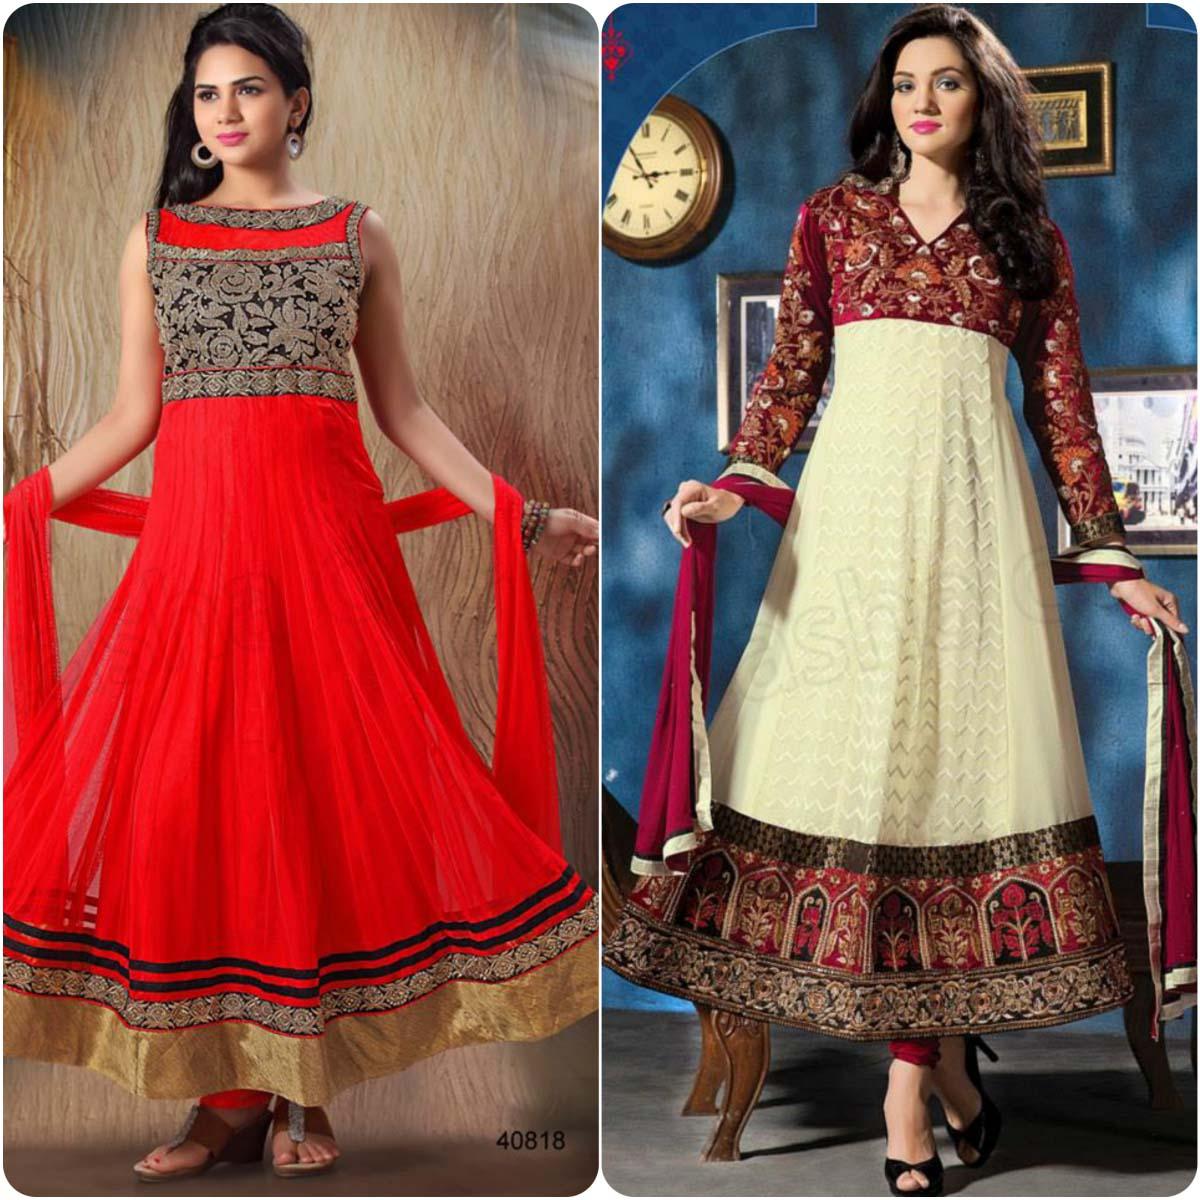 Natasha Couture Latest Indian Anarkali Dress Desigs Collection 2016-2017...styloplanet (17)